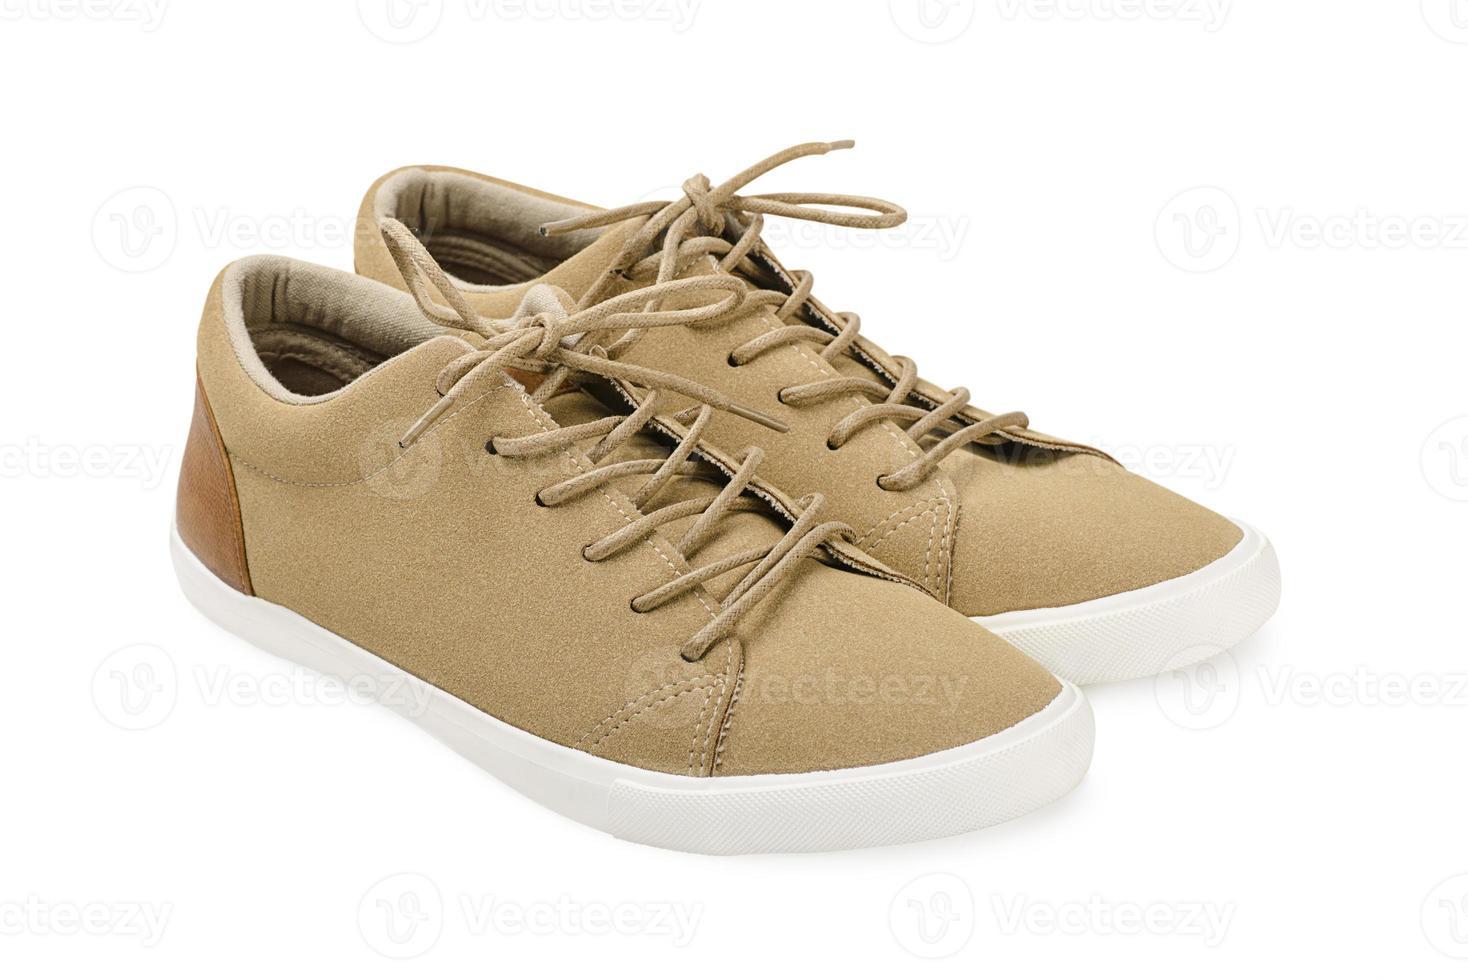 sapatos de camurça foto